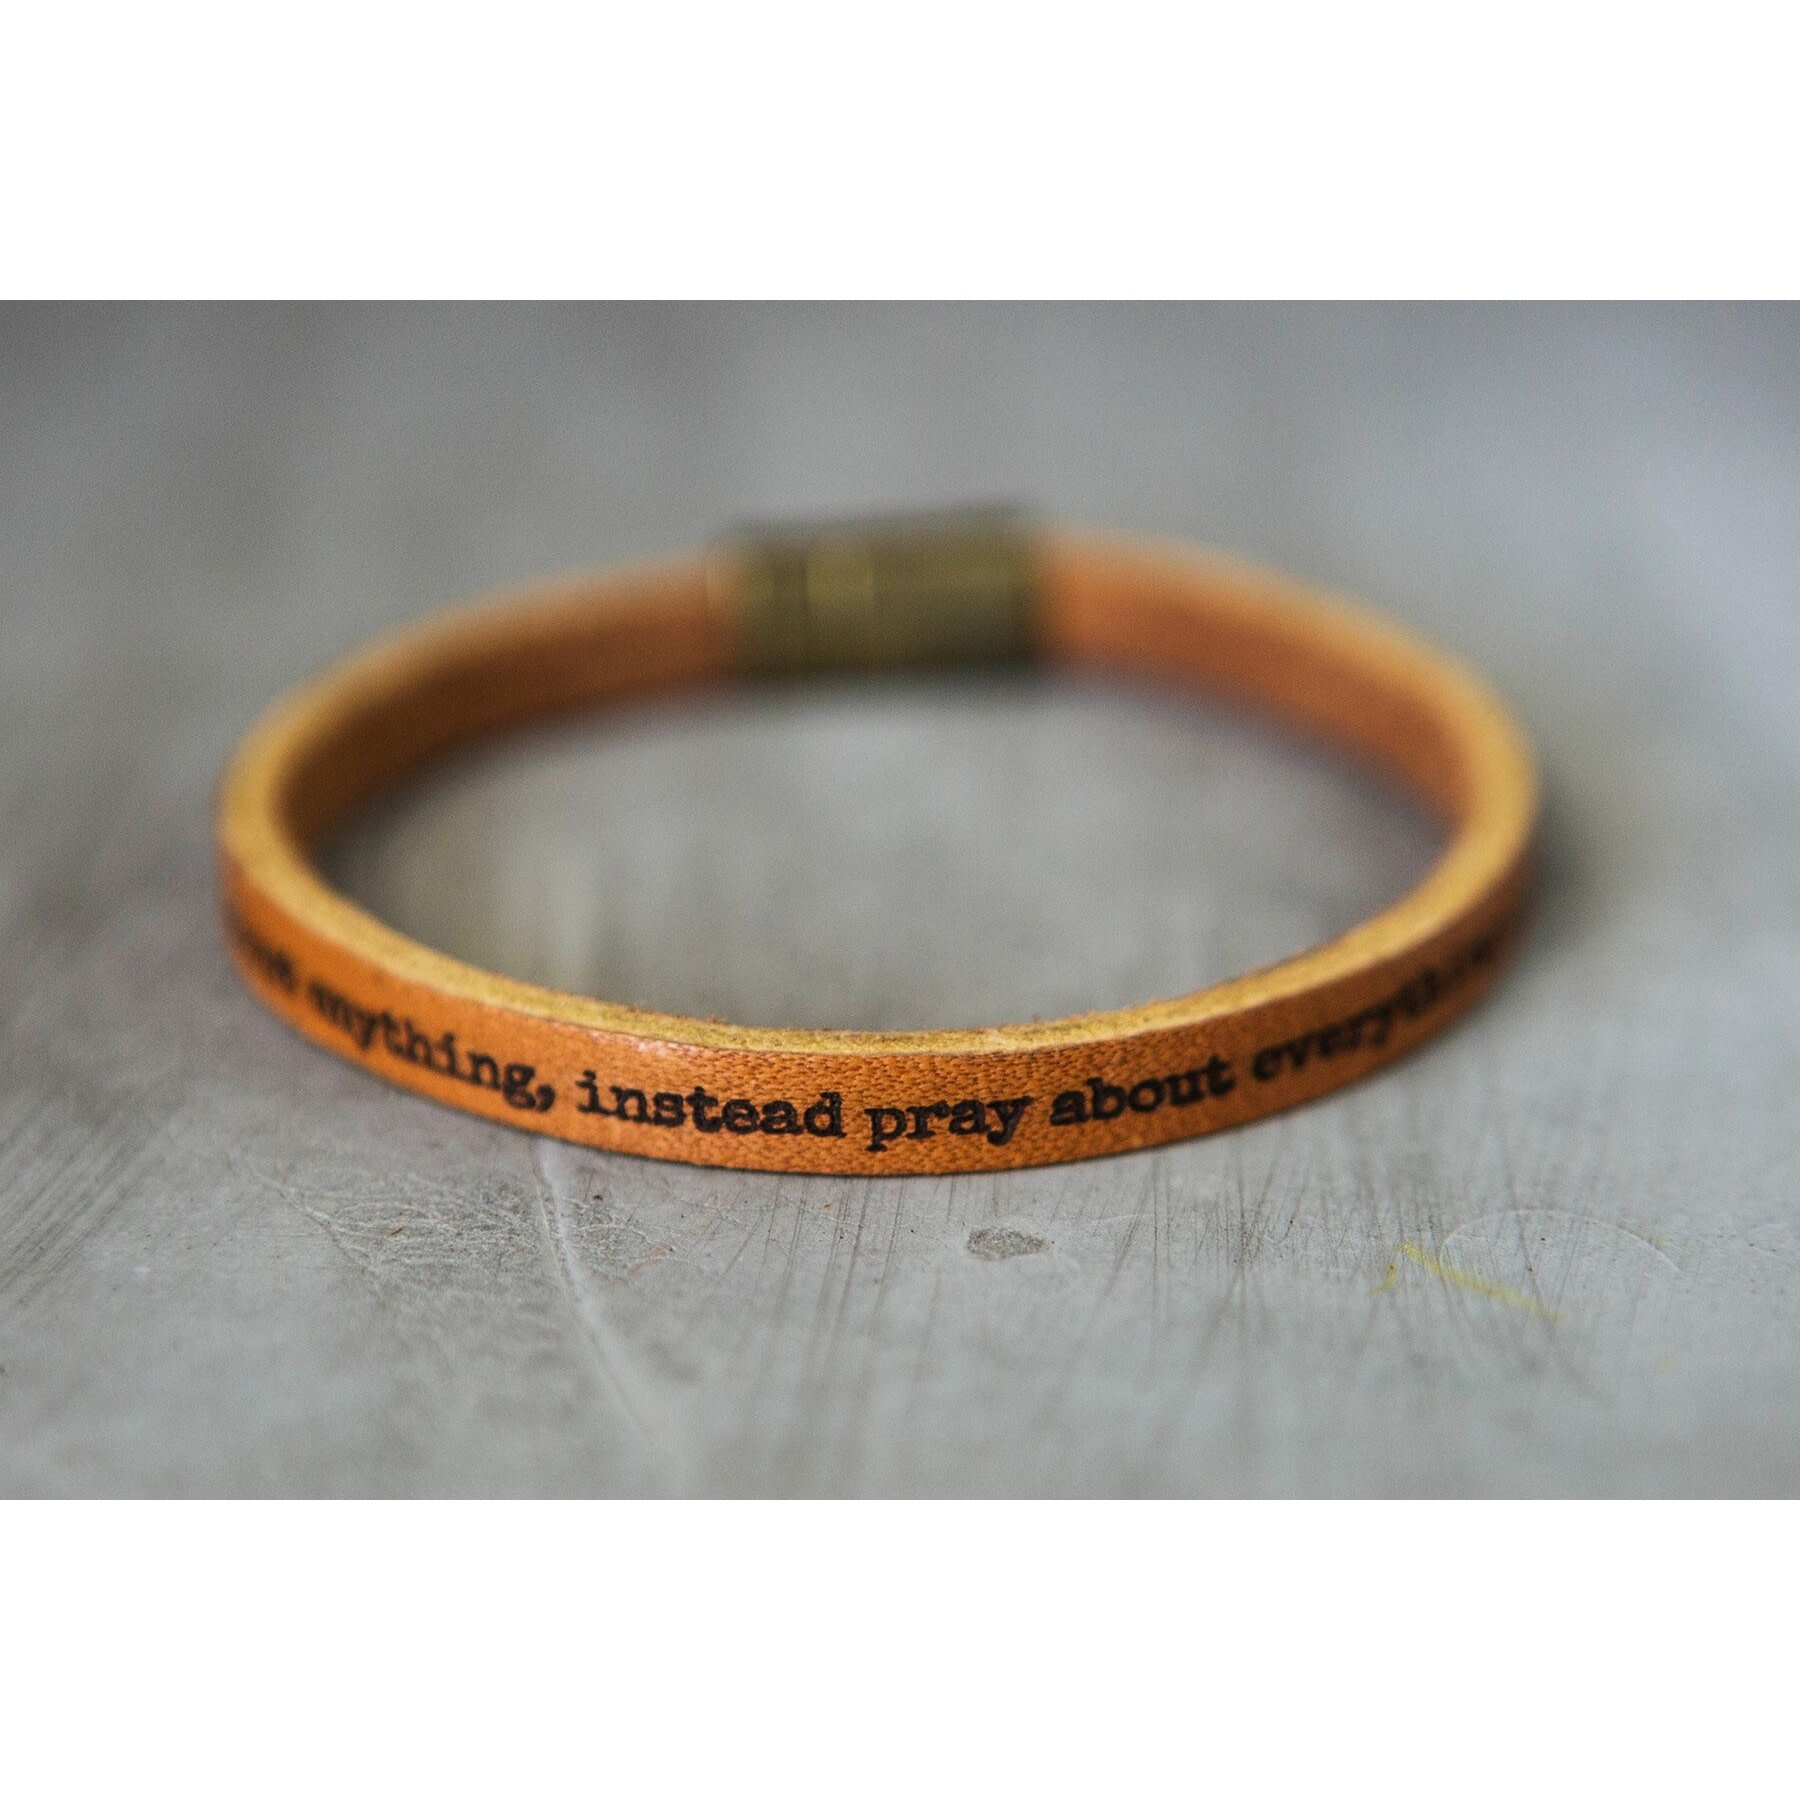 Cherished Leather Bracelet